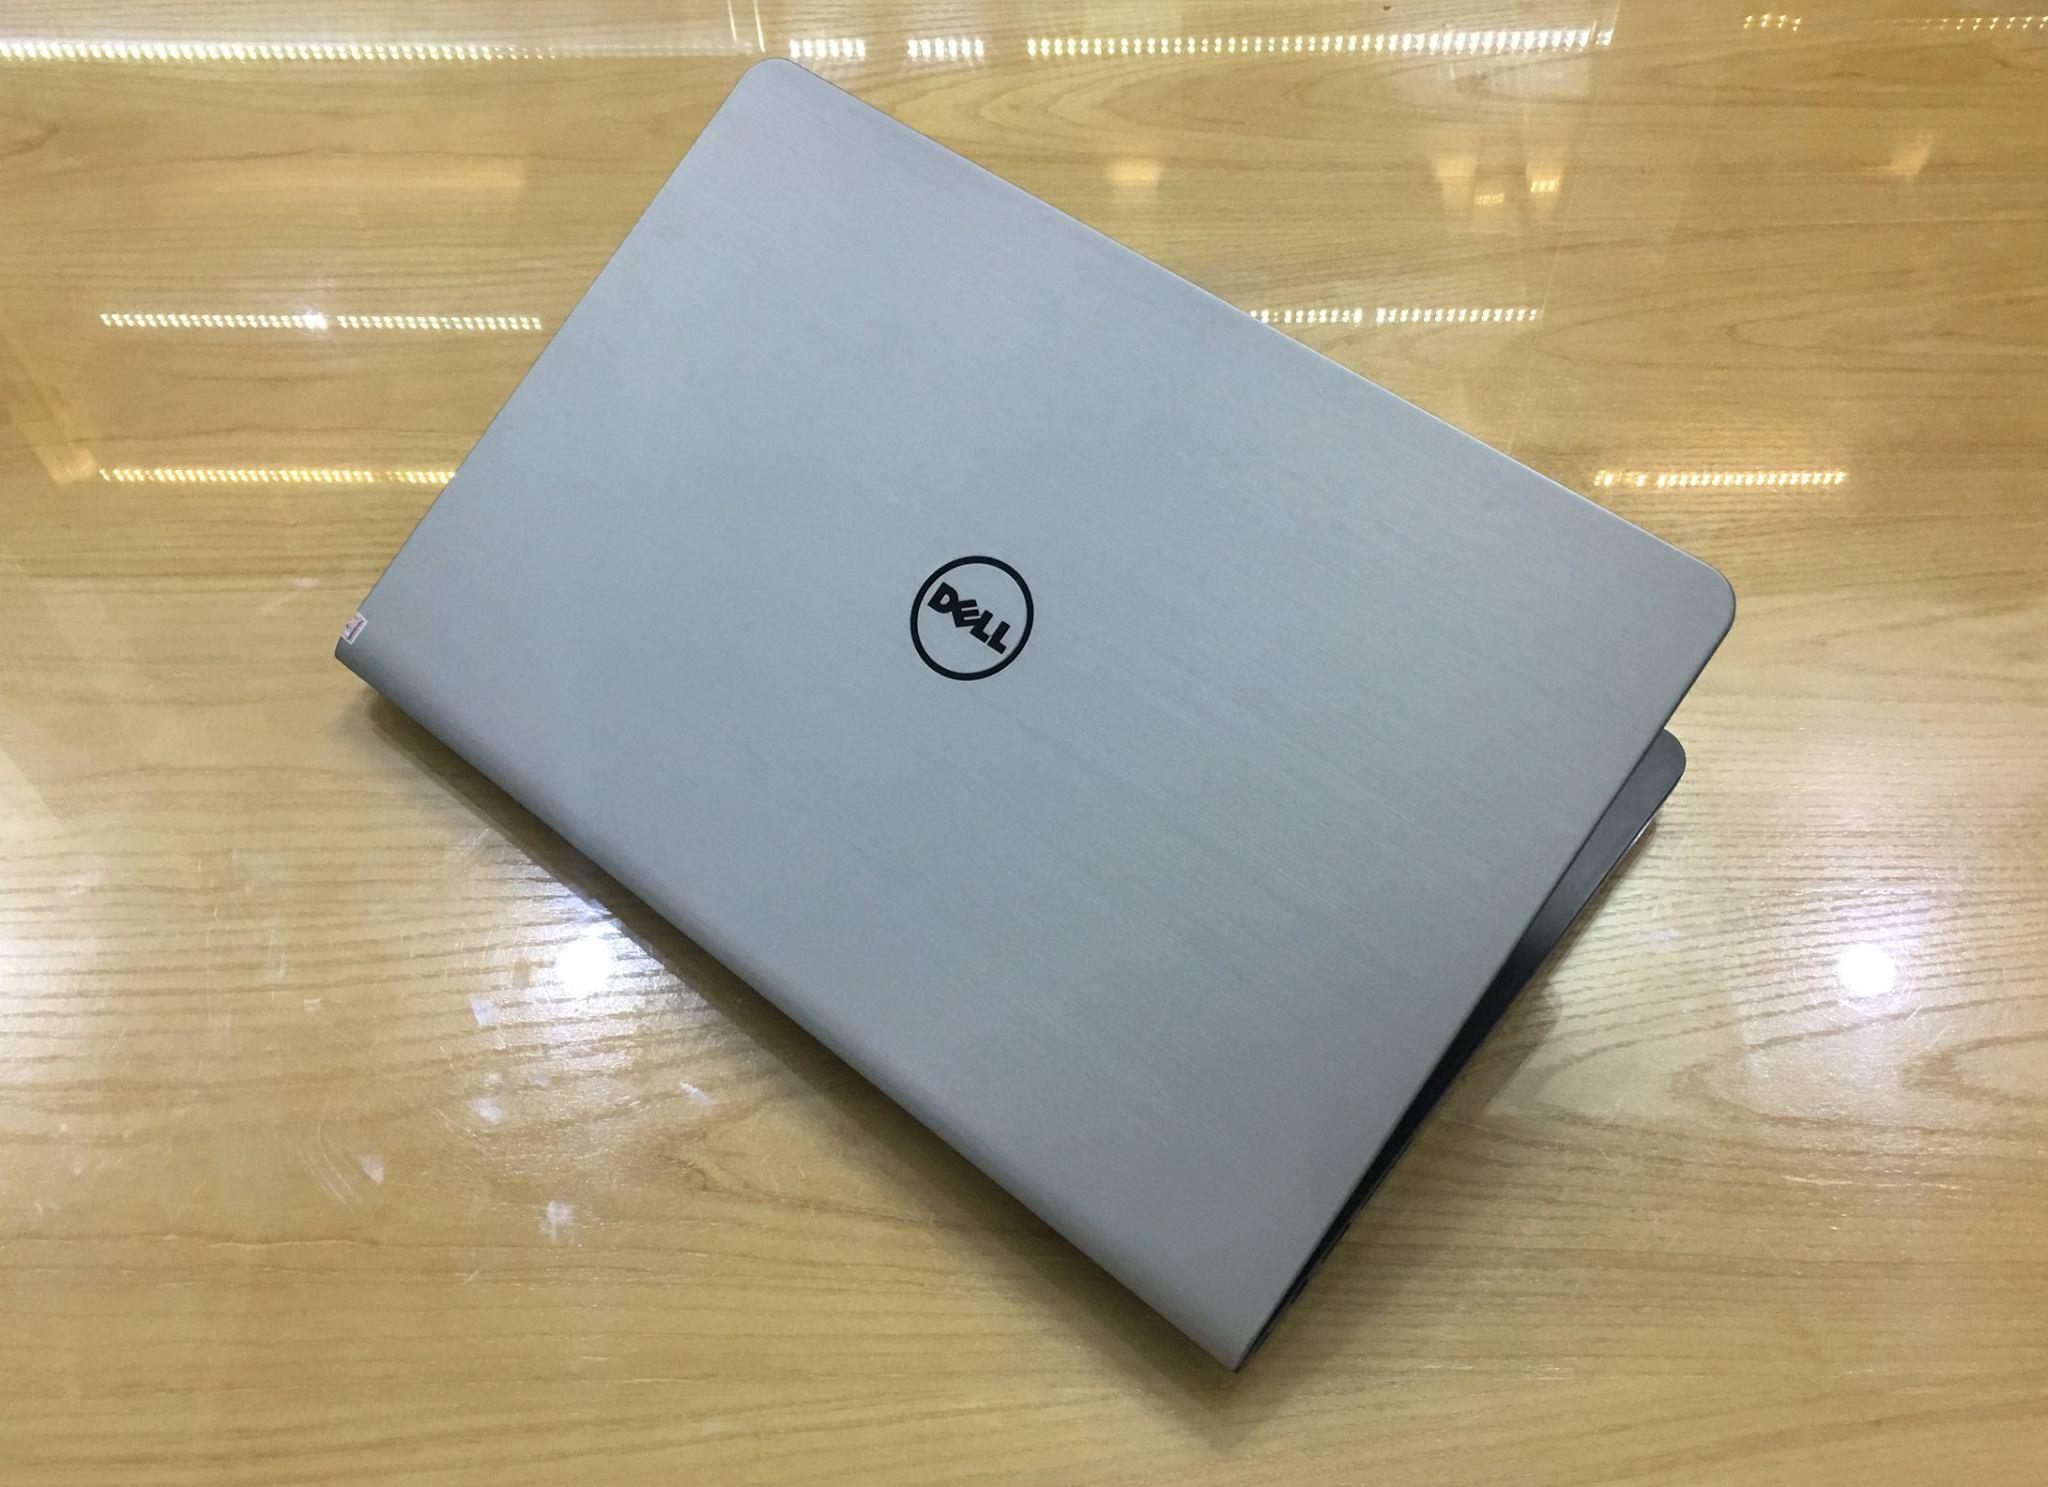 laptop-dell-inspiron-5548-core-i5-cu-hai-phong